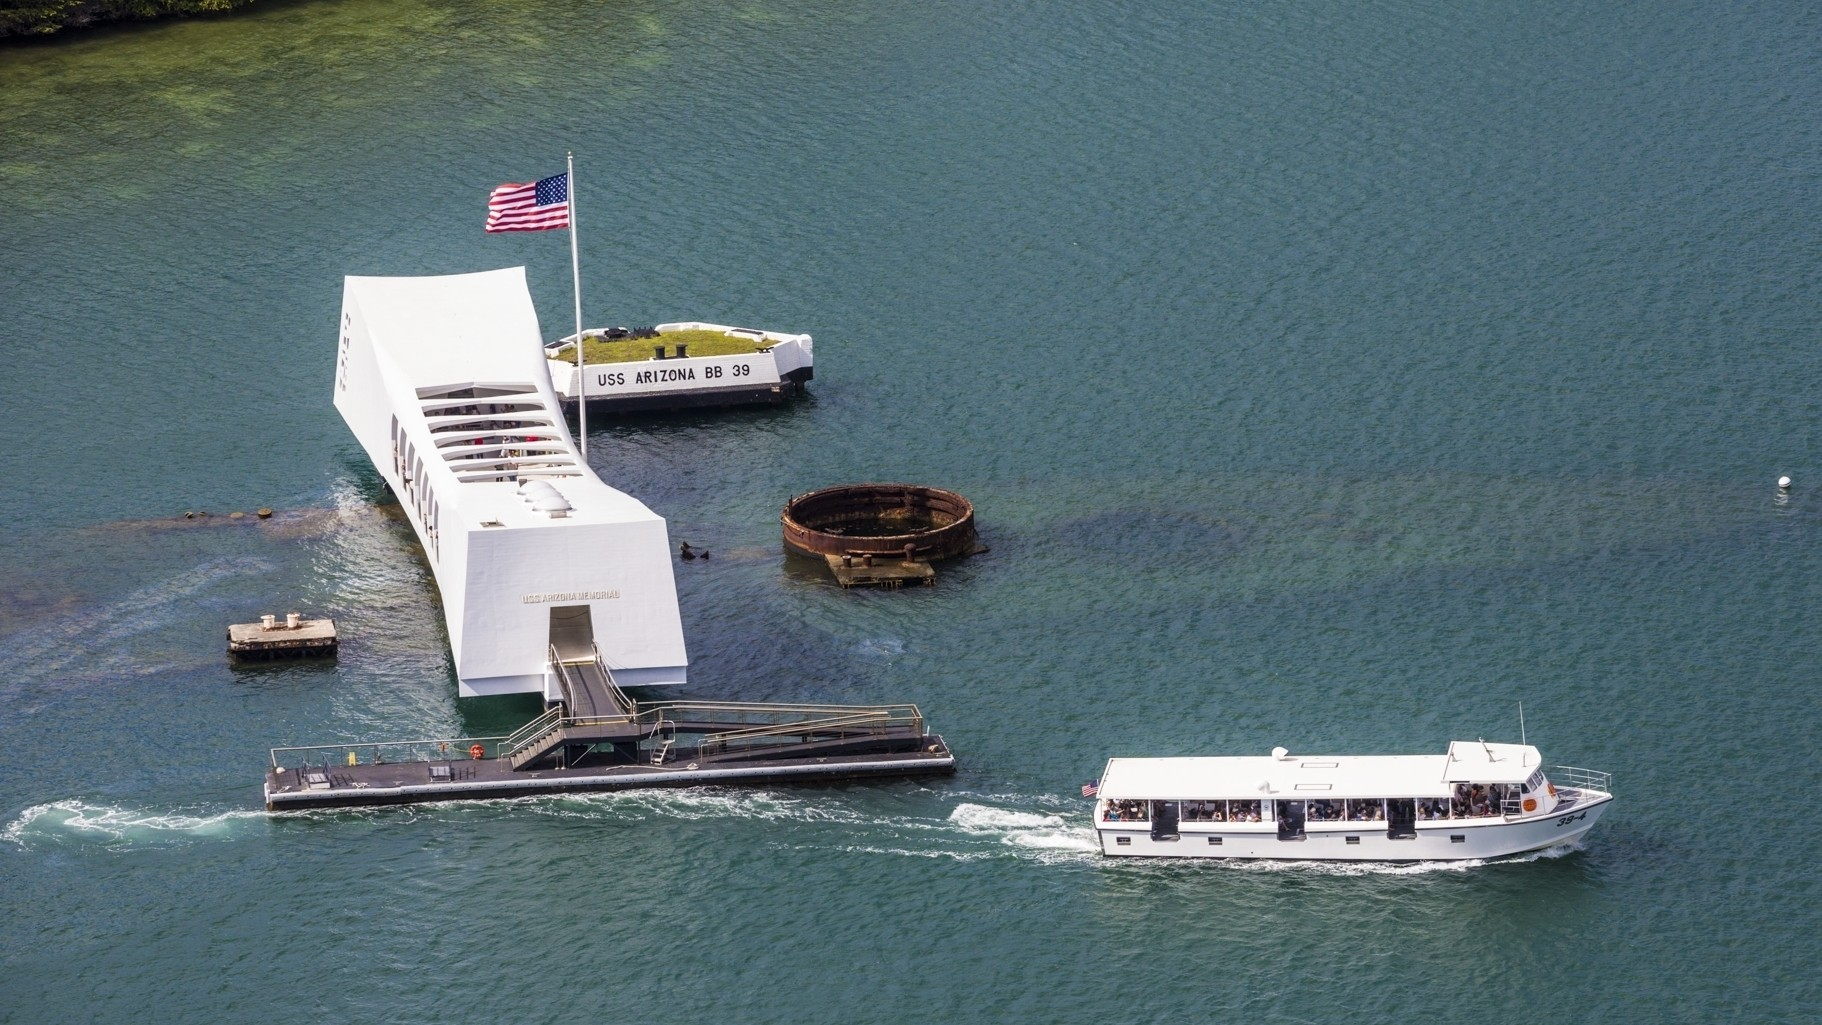 USS Arizona Memorial at Pearl Harbor closed after Navy